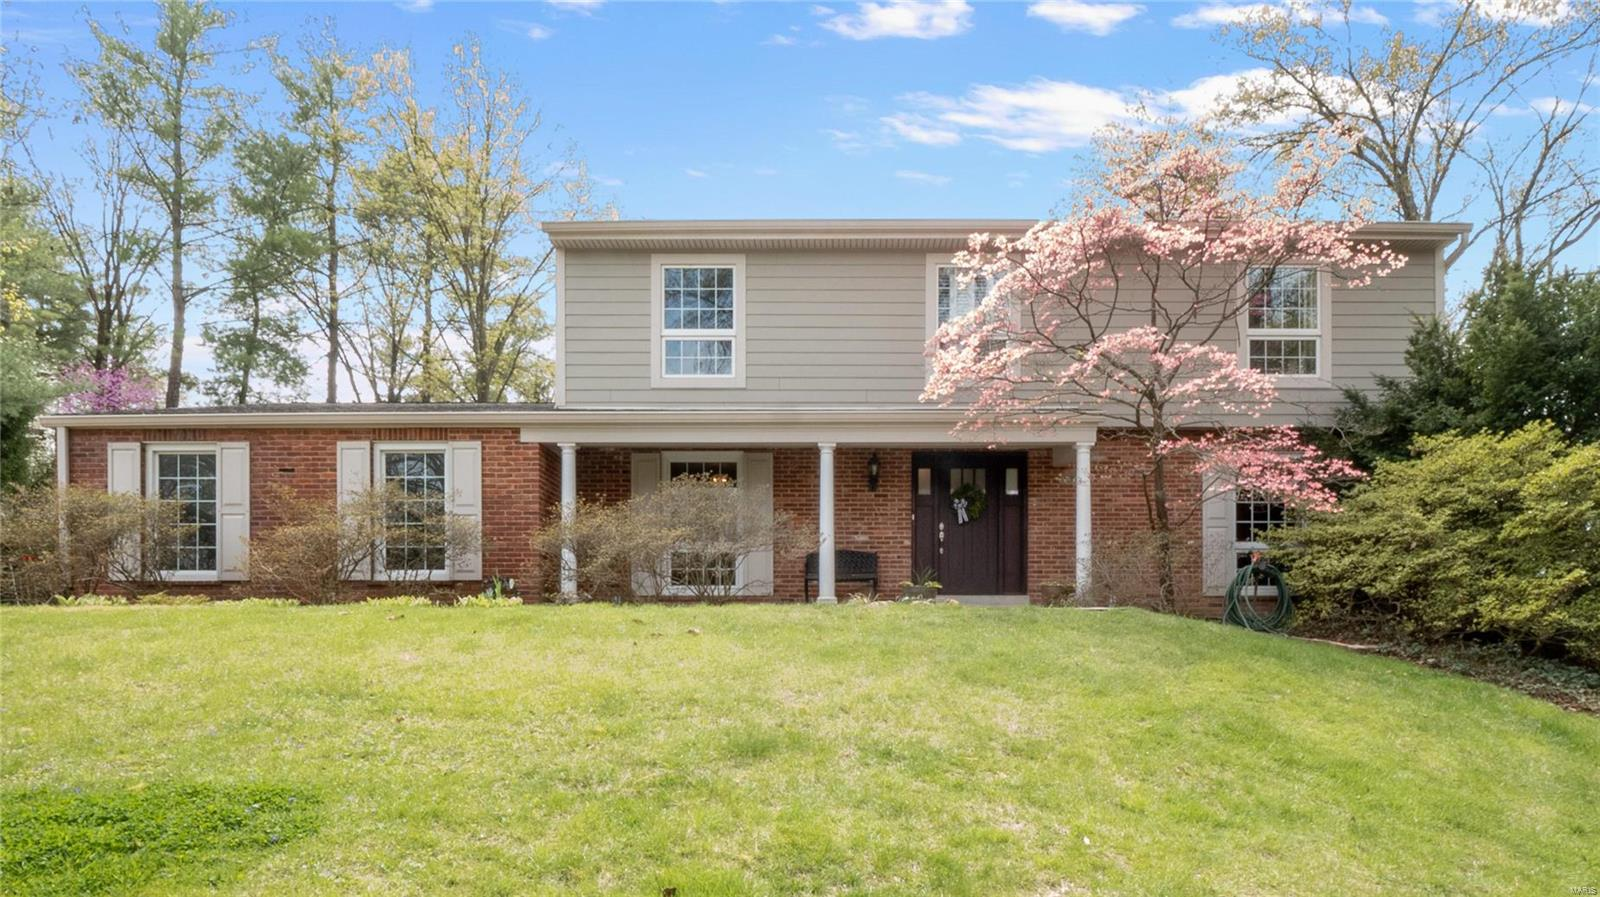 544 Timberwyck Drive Property Photo - Frontenac, MO real estate listing